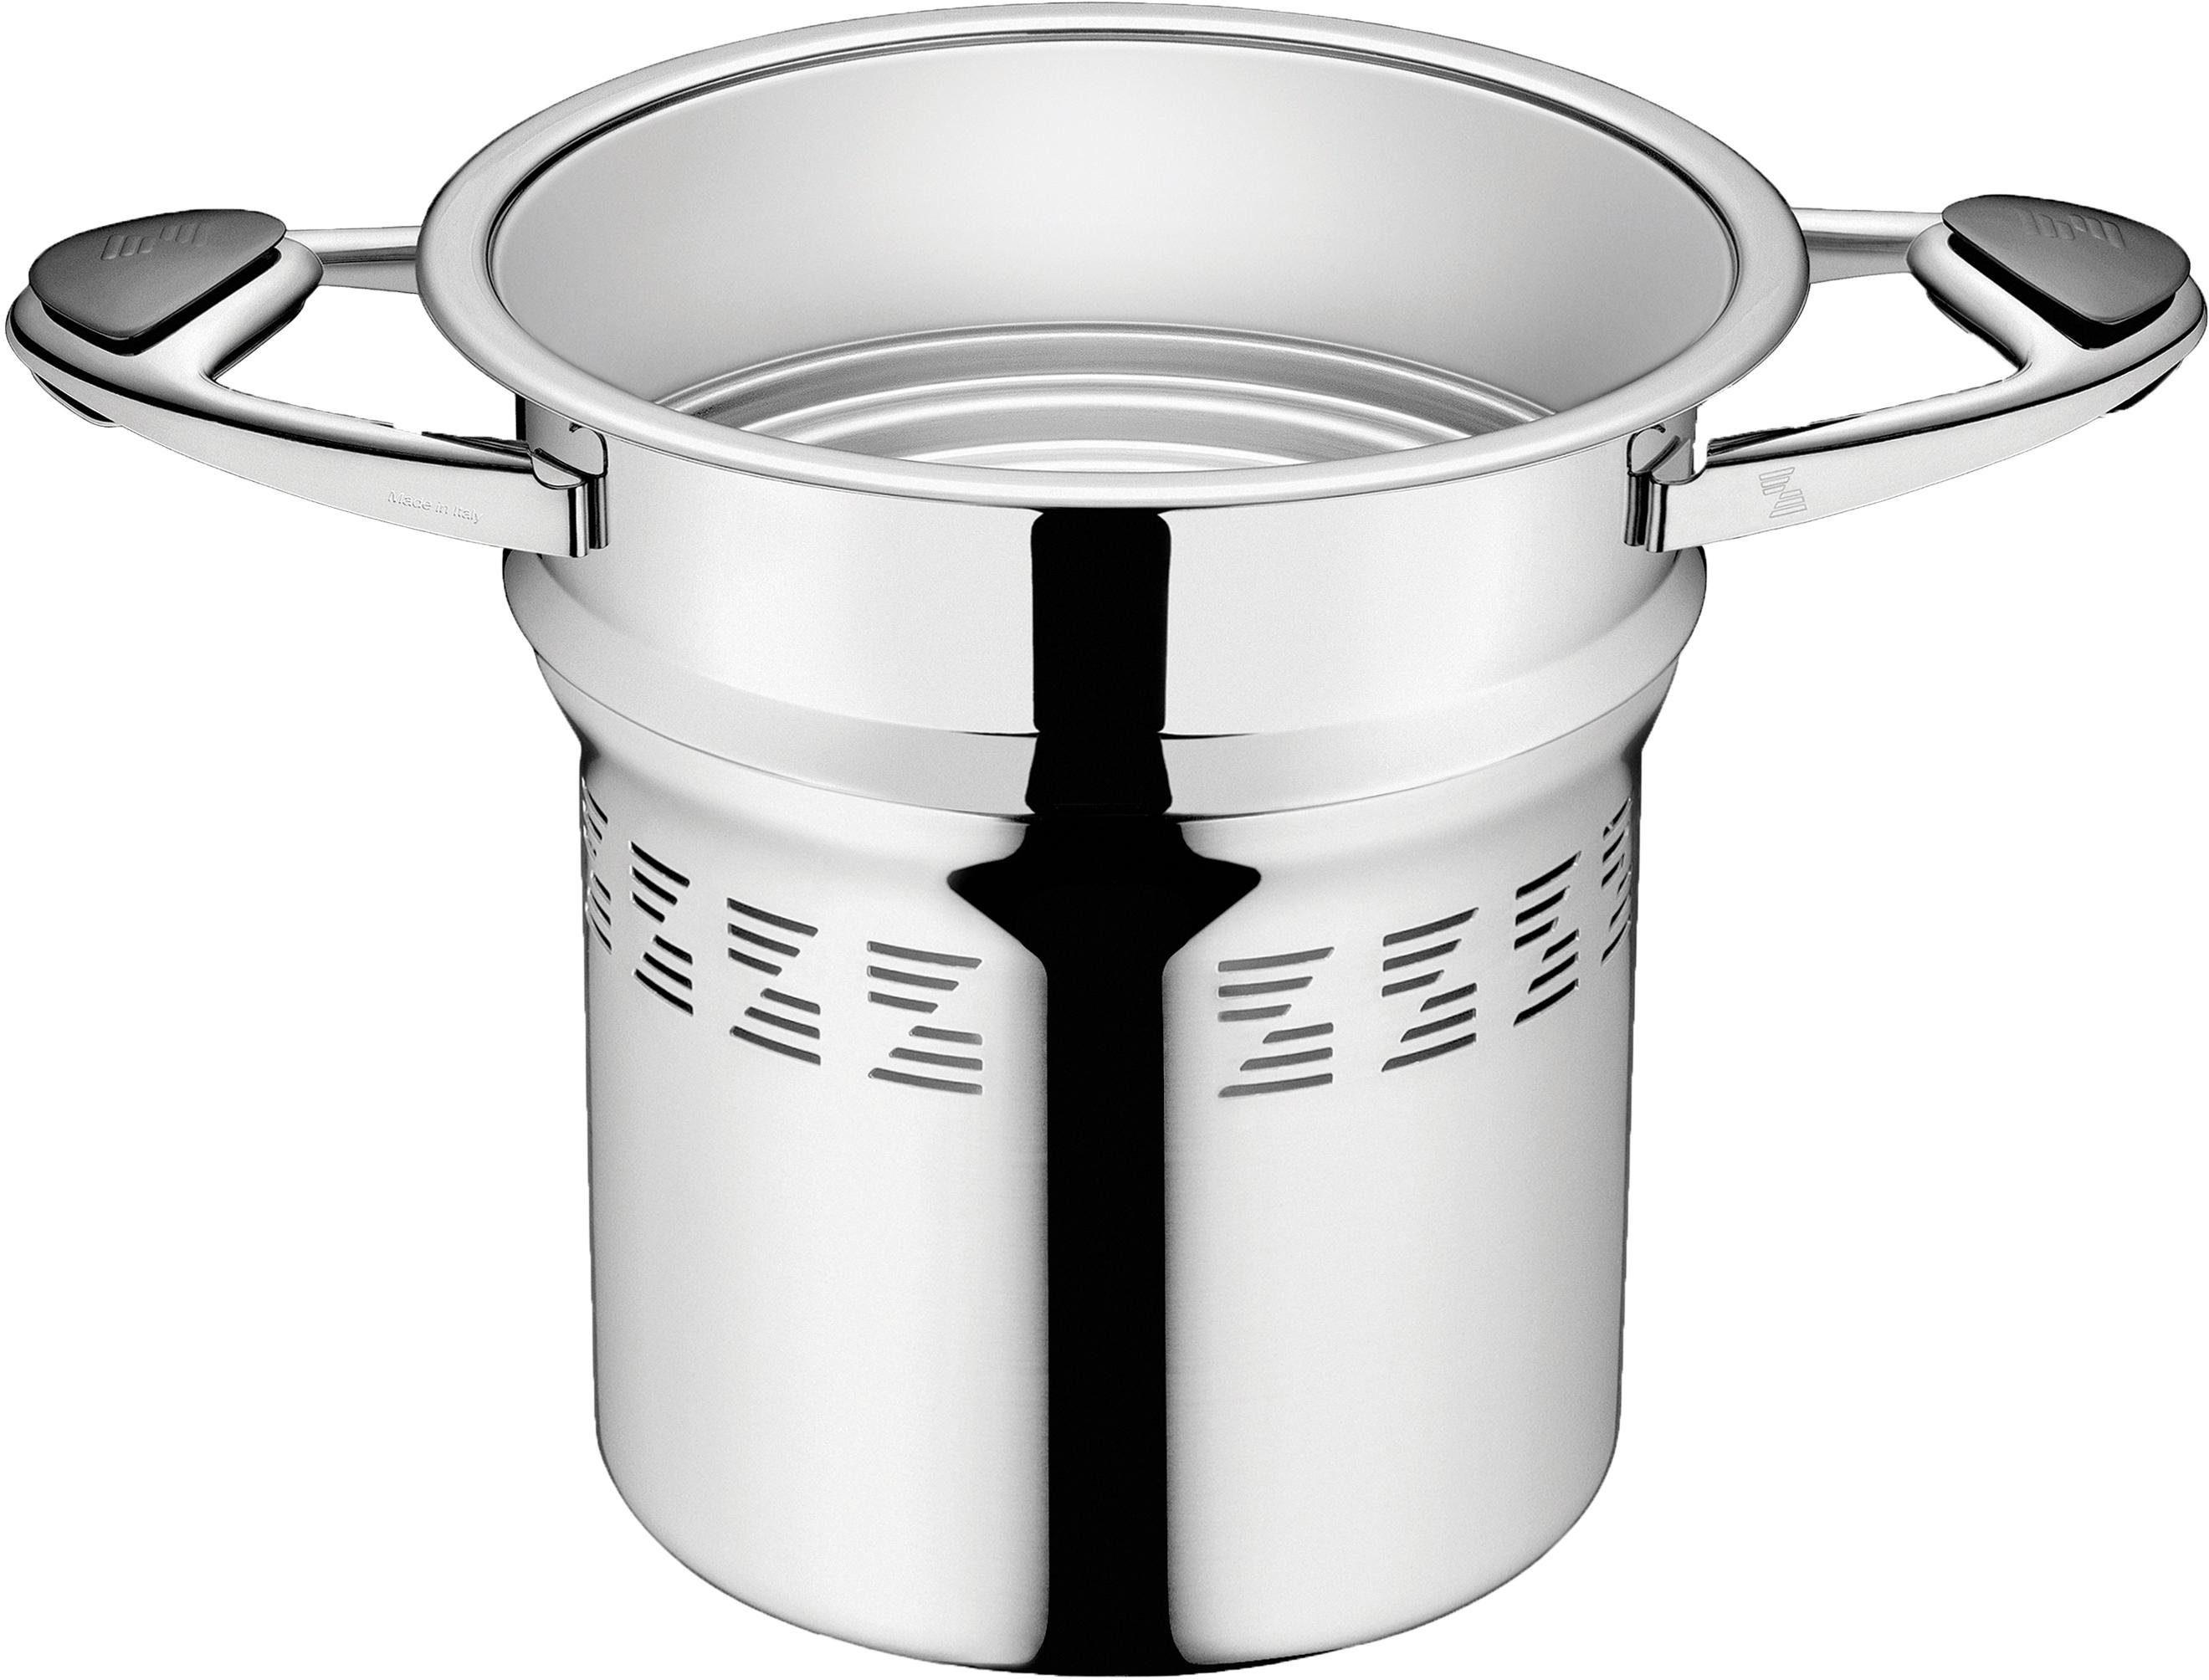 Zepter Medical Spaghetti-Einsatz, Metall 316L, Ø 20 cm